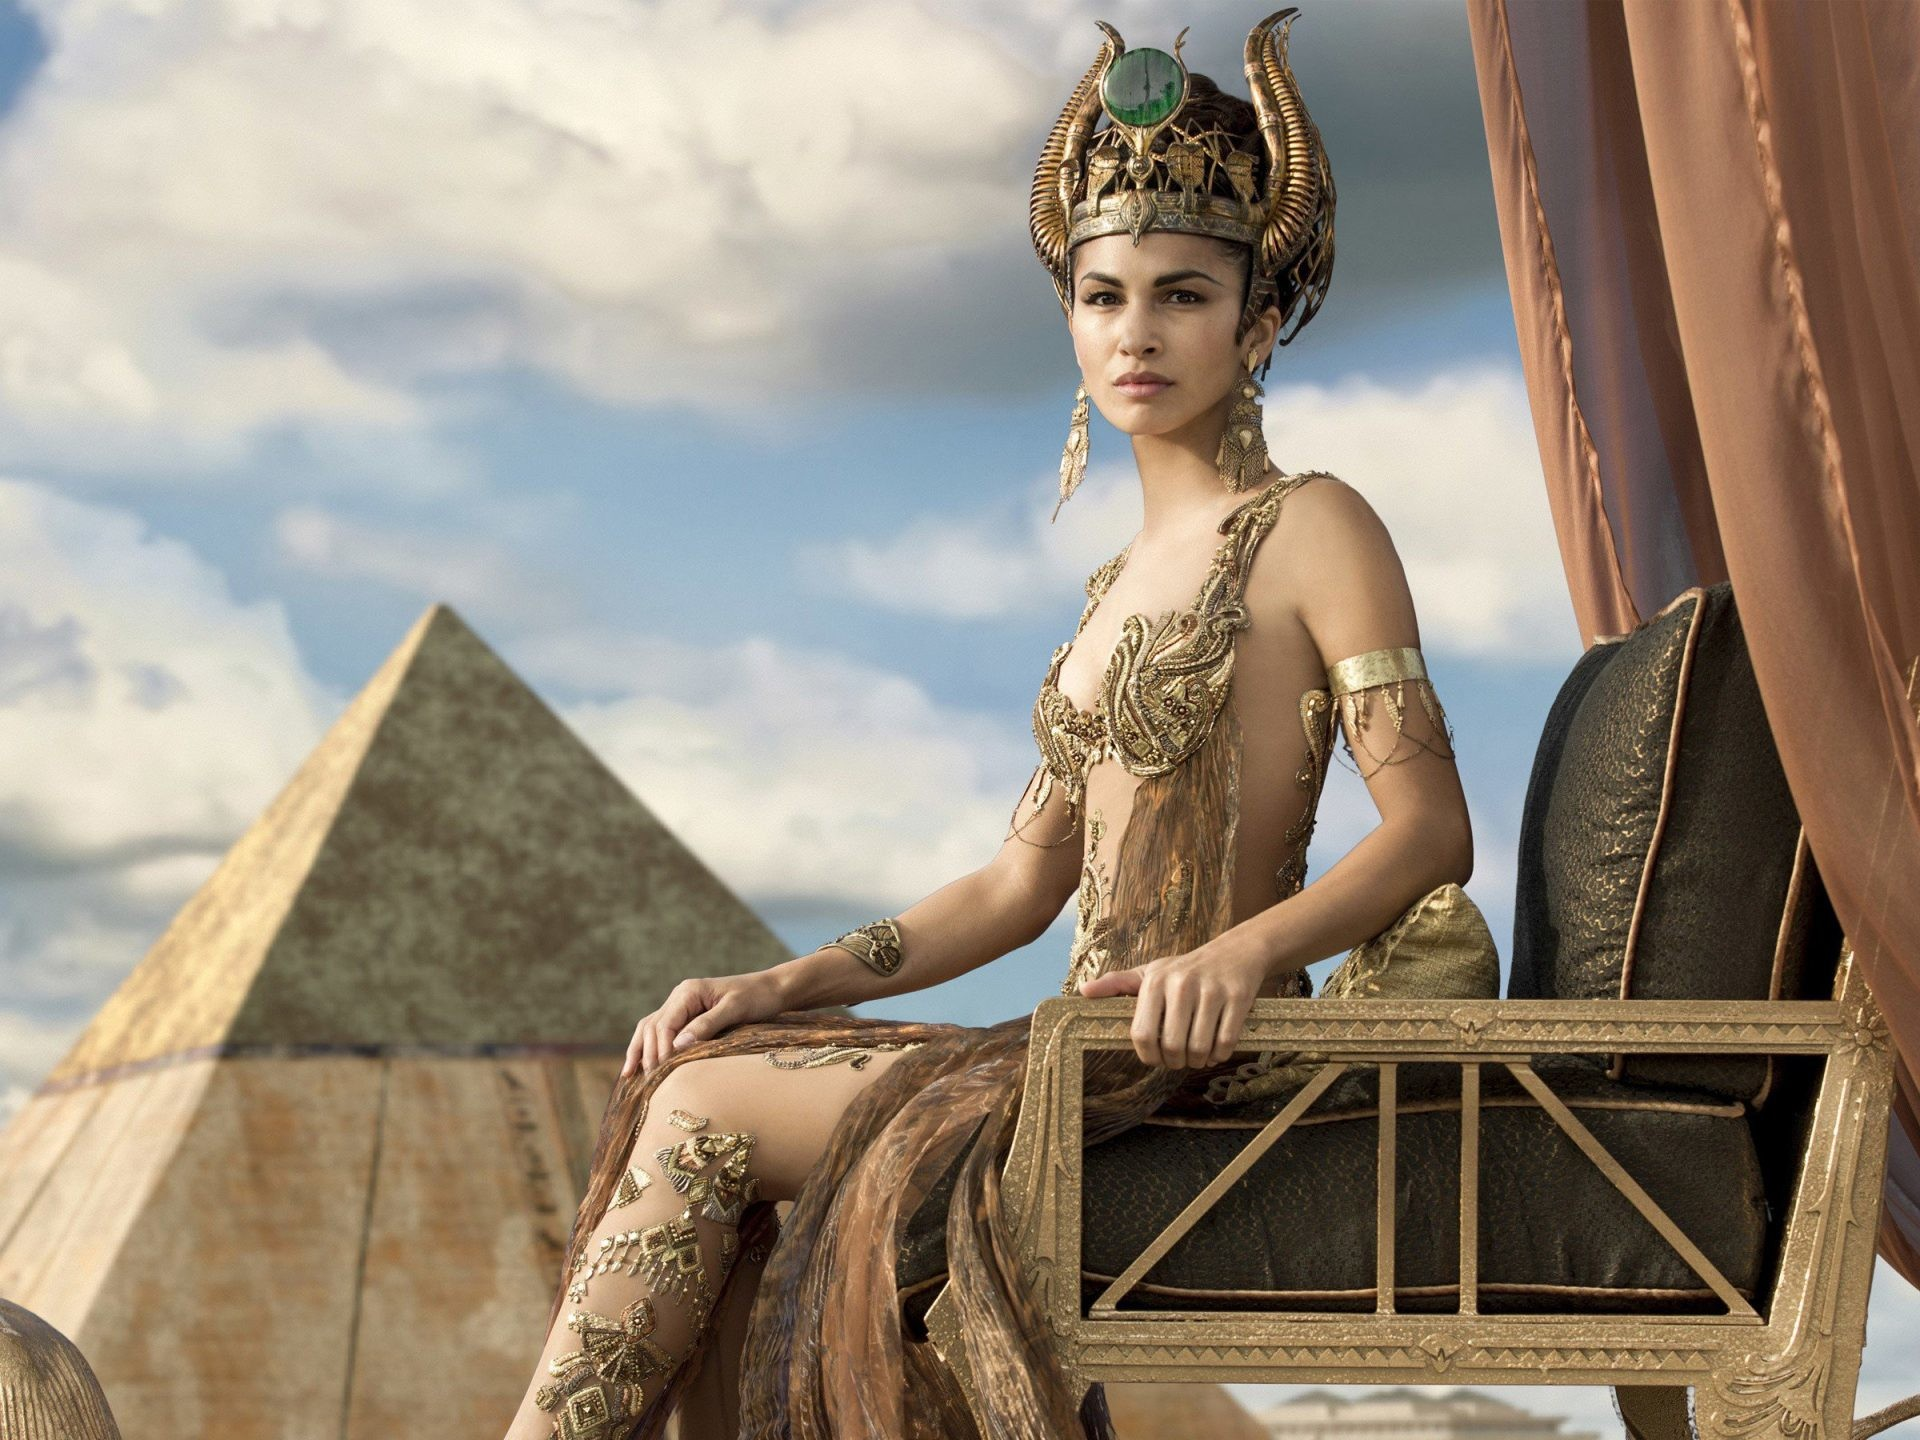 2016 Elodie Yung As Hathor Goddess Of Love Wallpaper Widescreen Hd ..